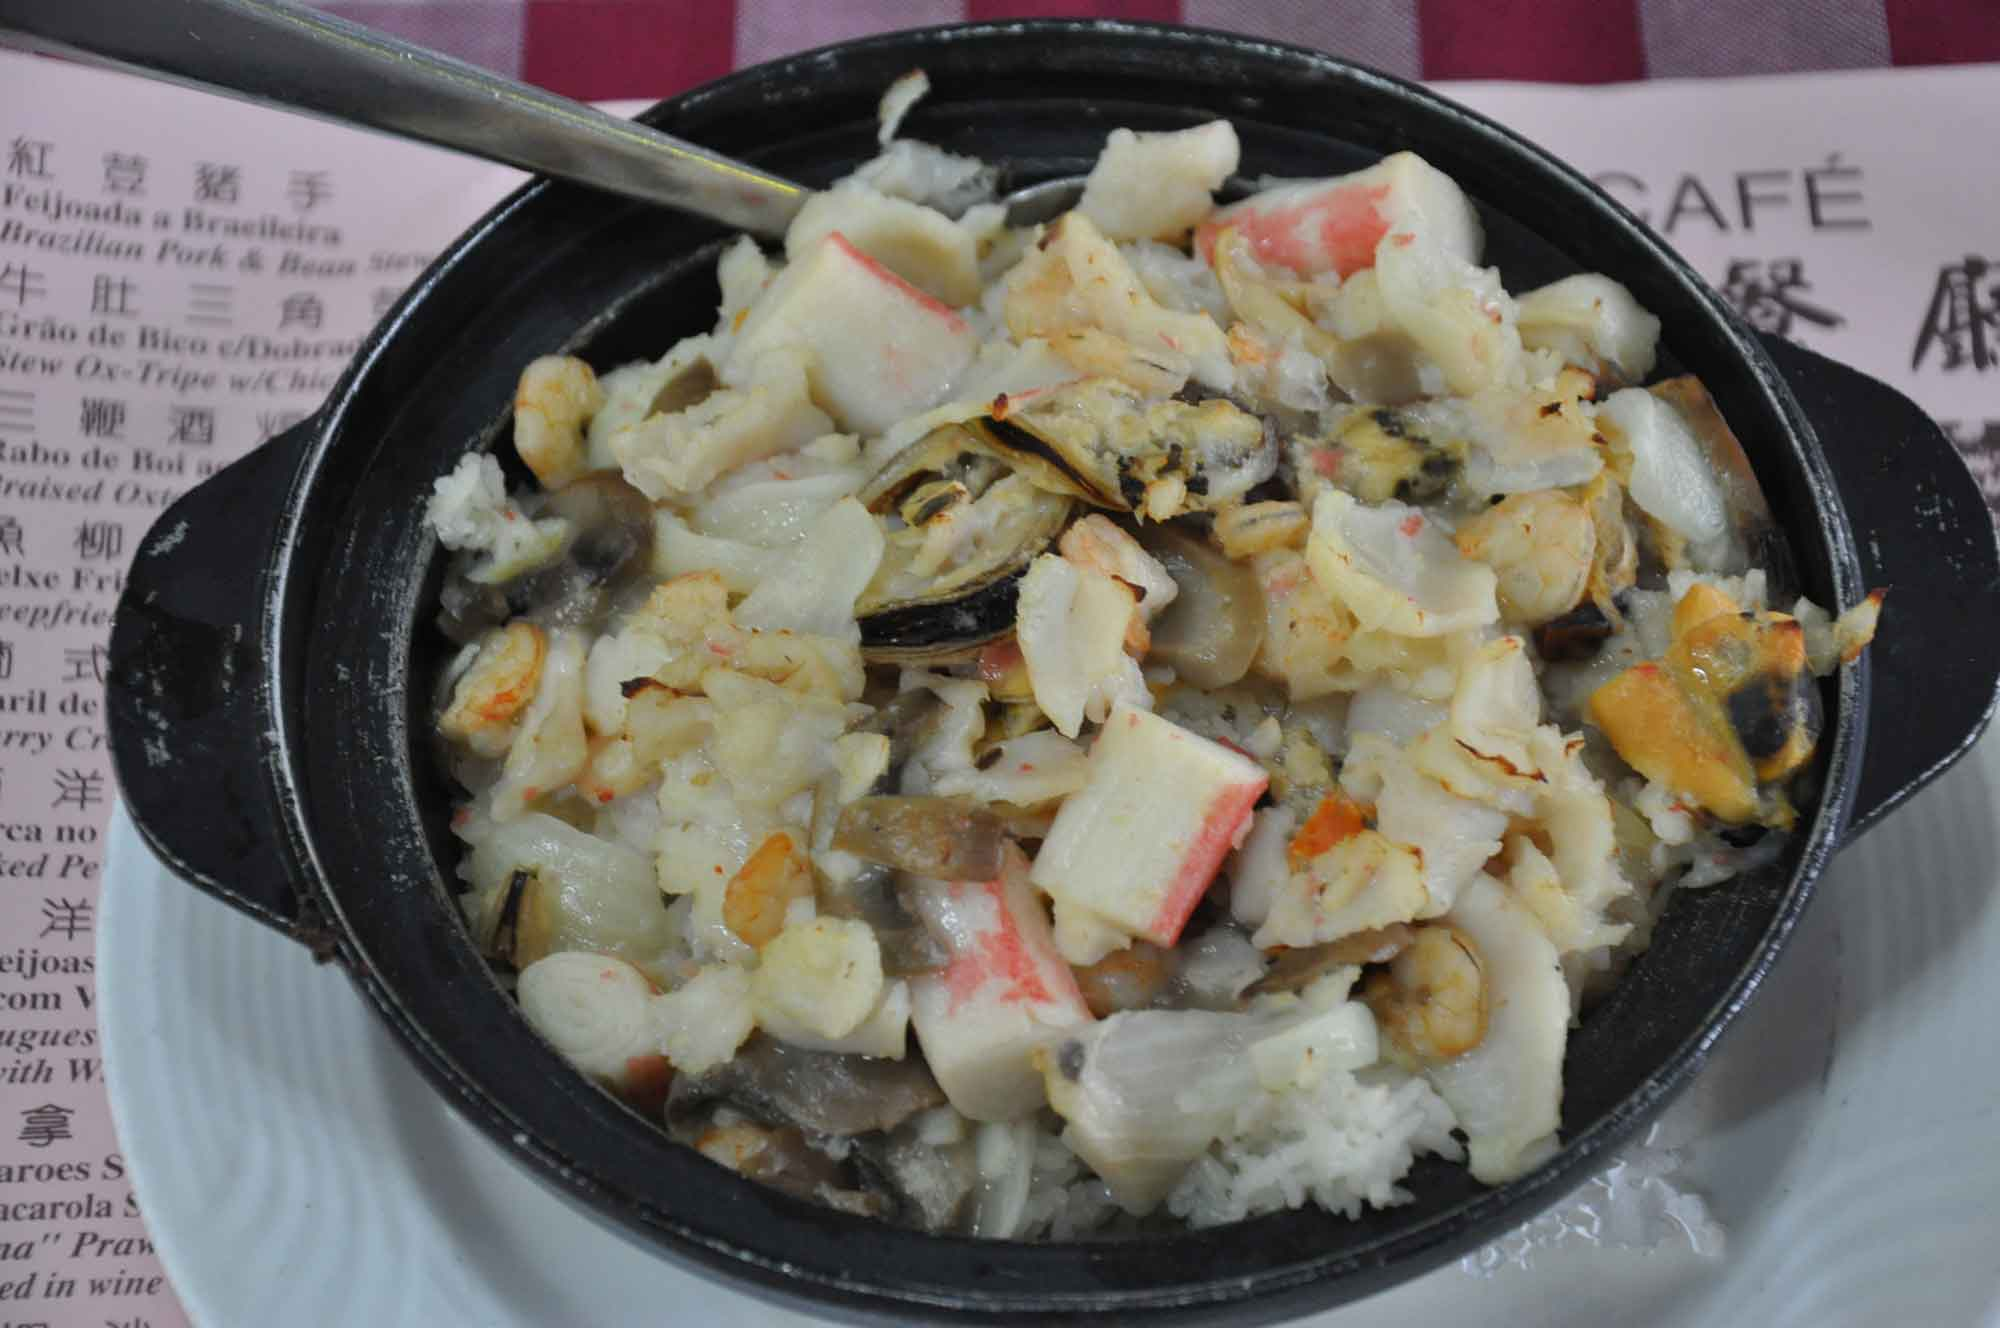 Best Macau Dishes: Seafood Rice at Nga Tim